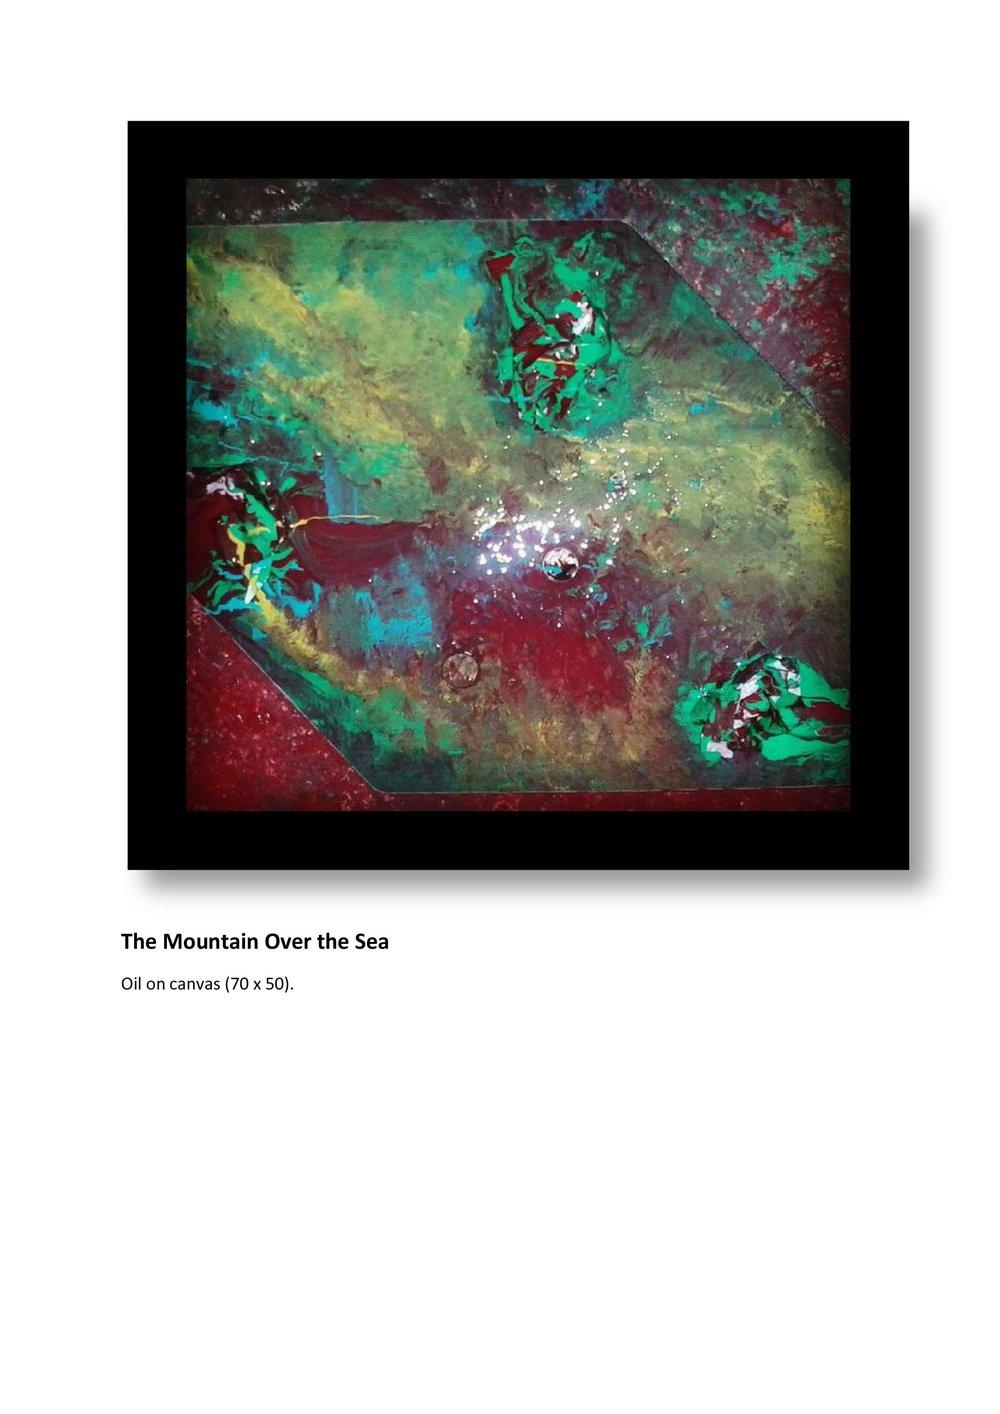 art-portfolio-aglae-corrected-24-min.jpg